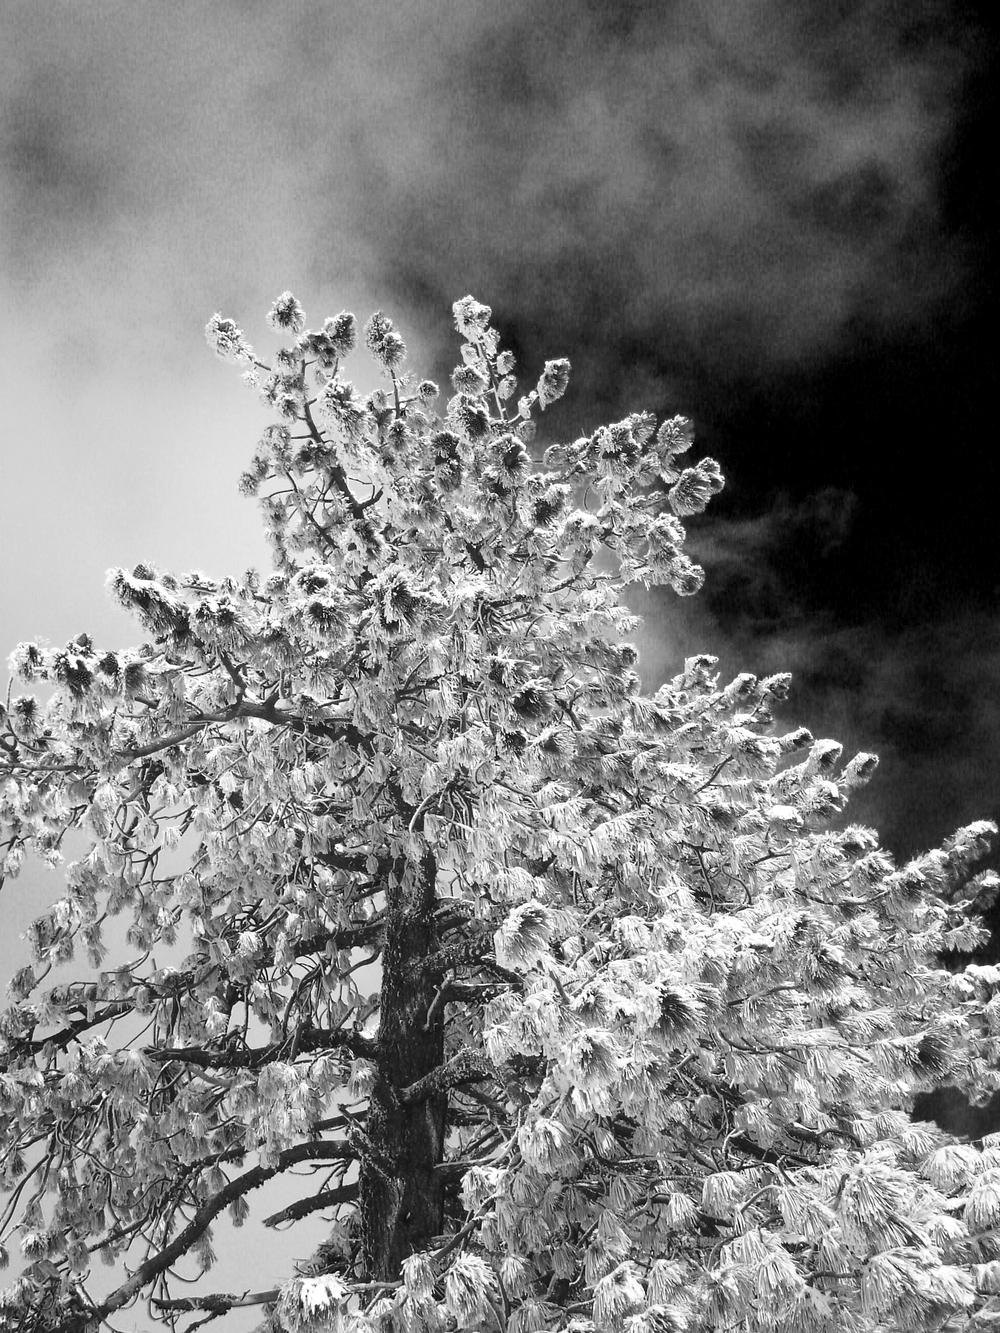 Rudy-Poe-34-Snow-Pine-1920.jpg